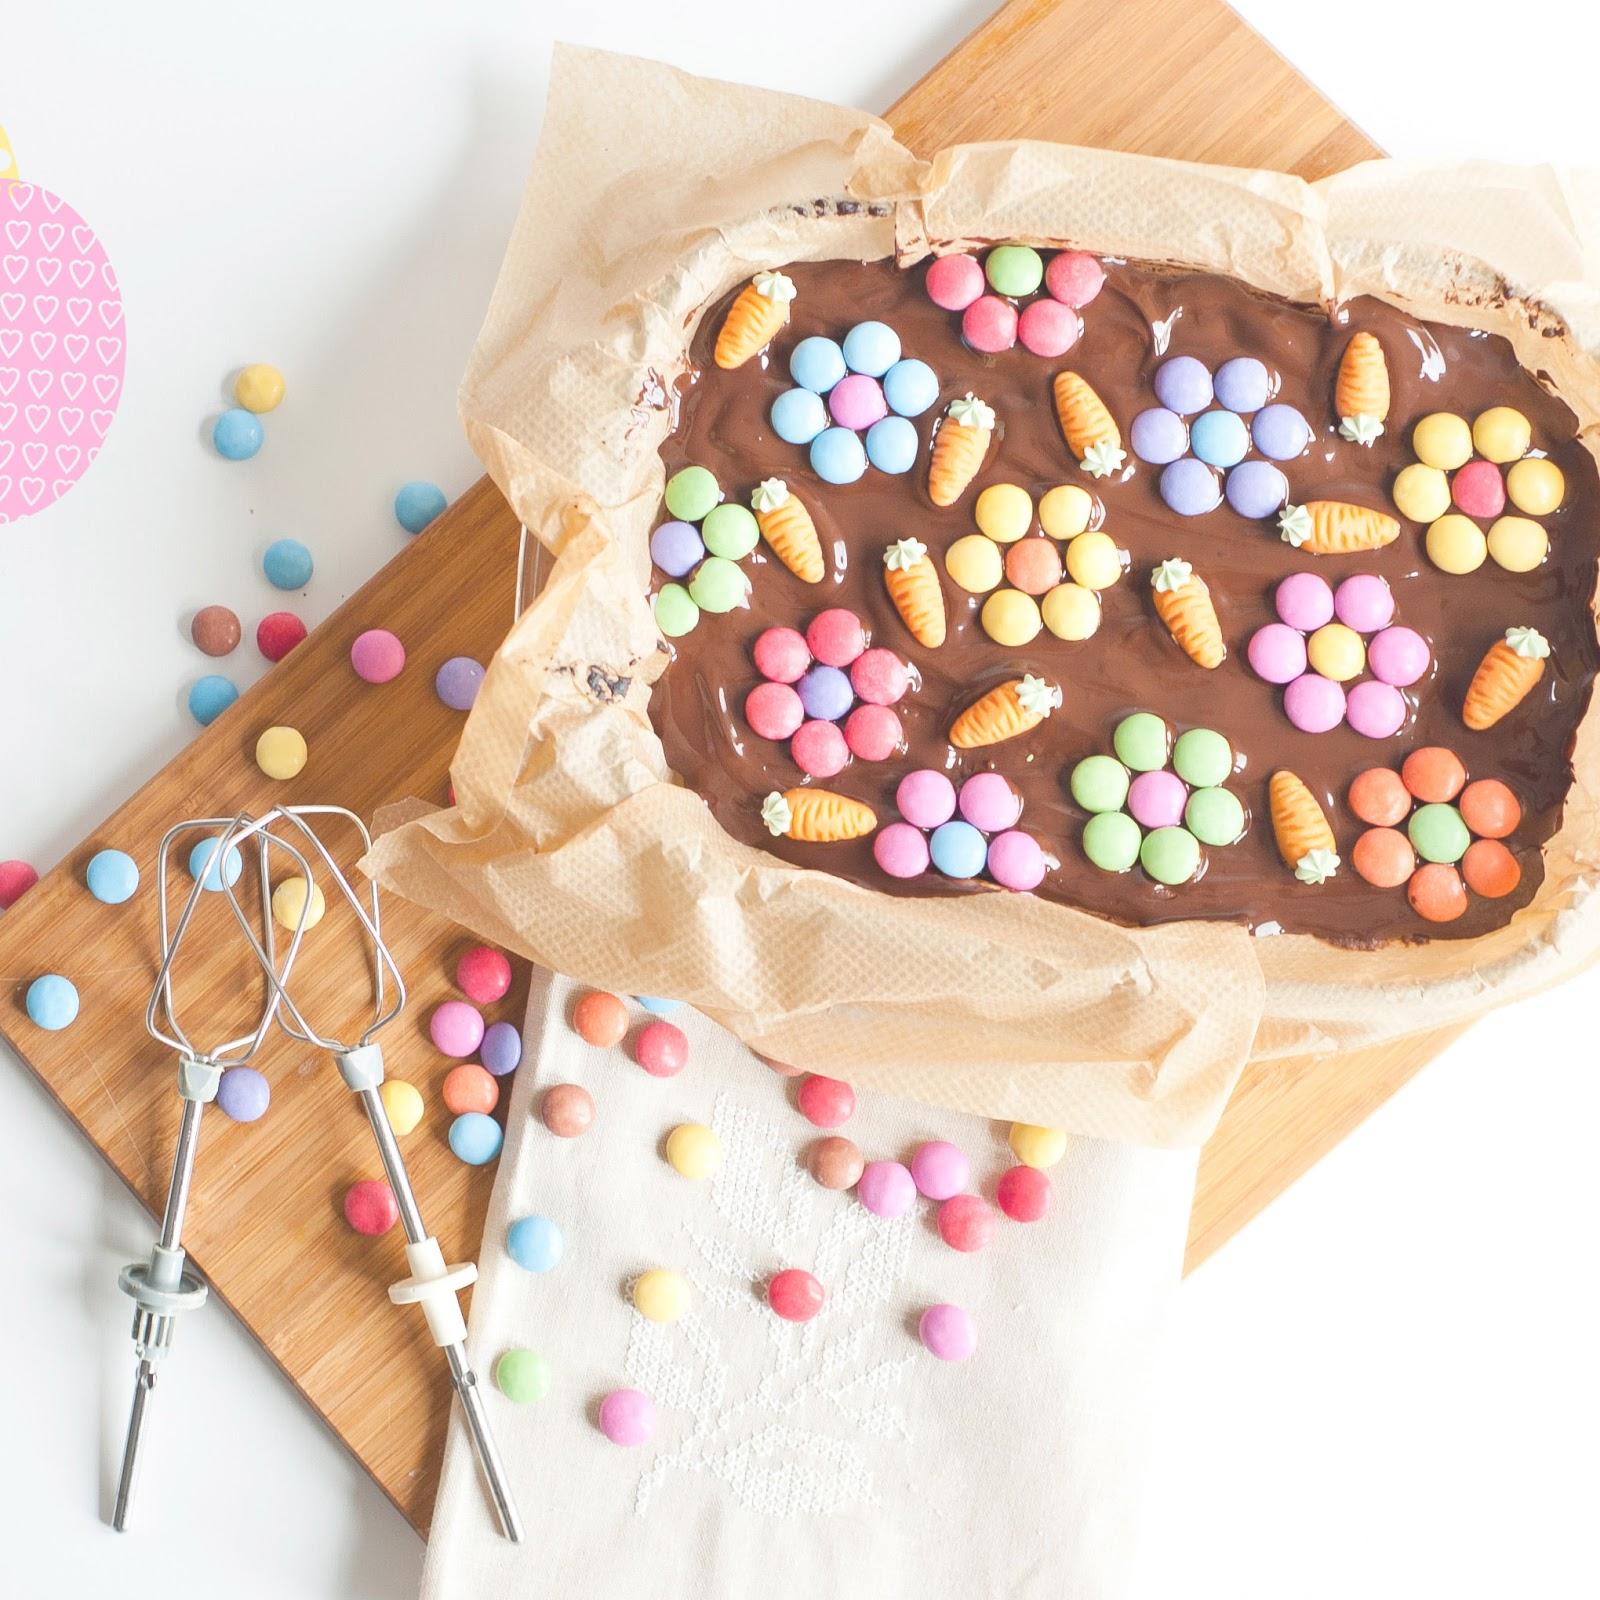 http://mademoiselle-nostalgeek.blogspot.be/2015/04/recette-brownies-moelleux.html